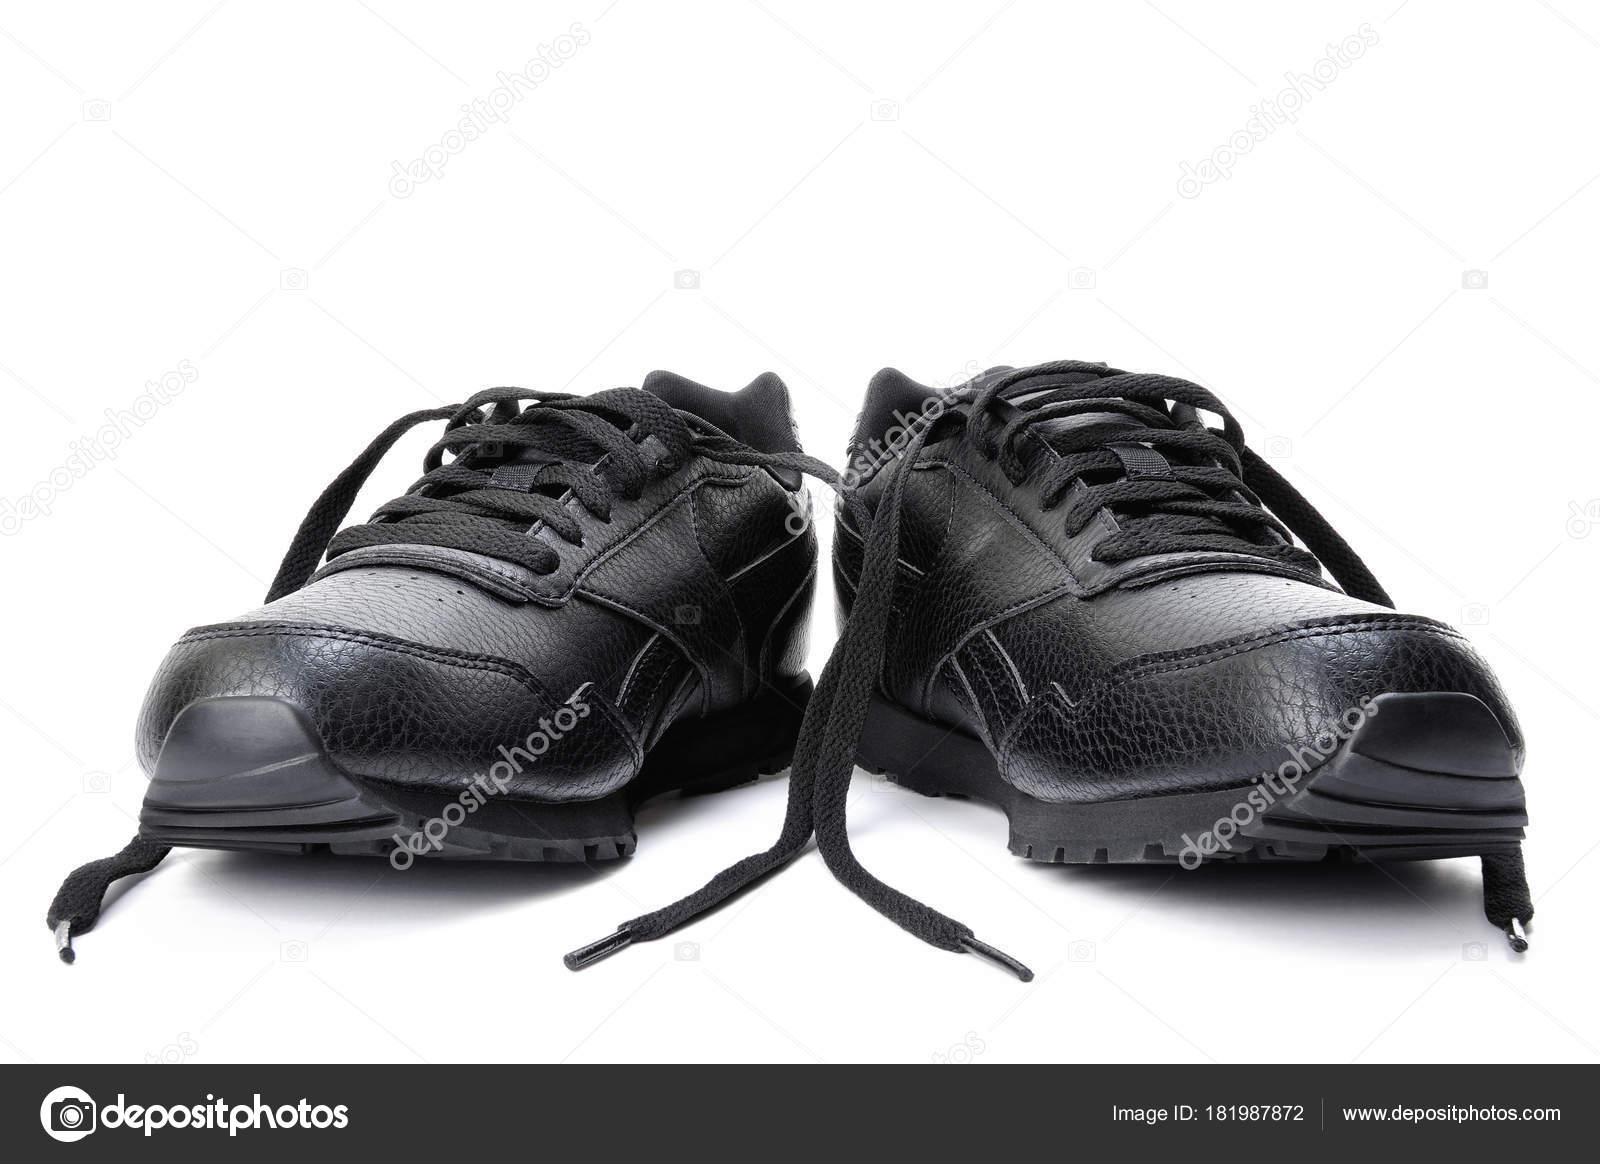 db28c940a68 Γκρο πλαν του ένα ζευγάρι μαύρα αθλητικά παπούτσια για τις γυναίκες, που  απομονώνονται σε λευκό φόντο — Εικόνα από francescomoufotografo| ...